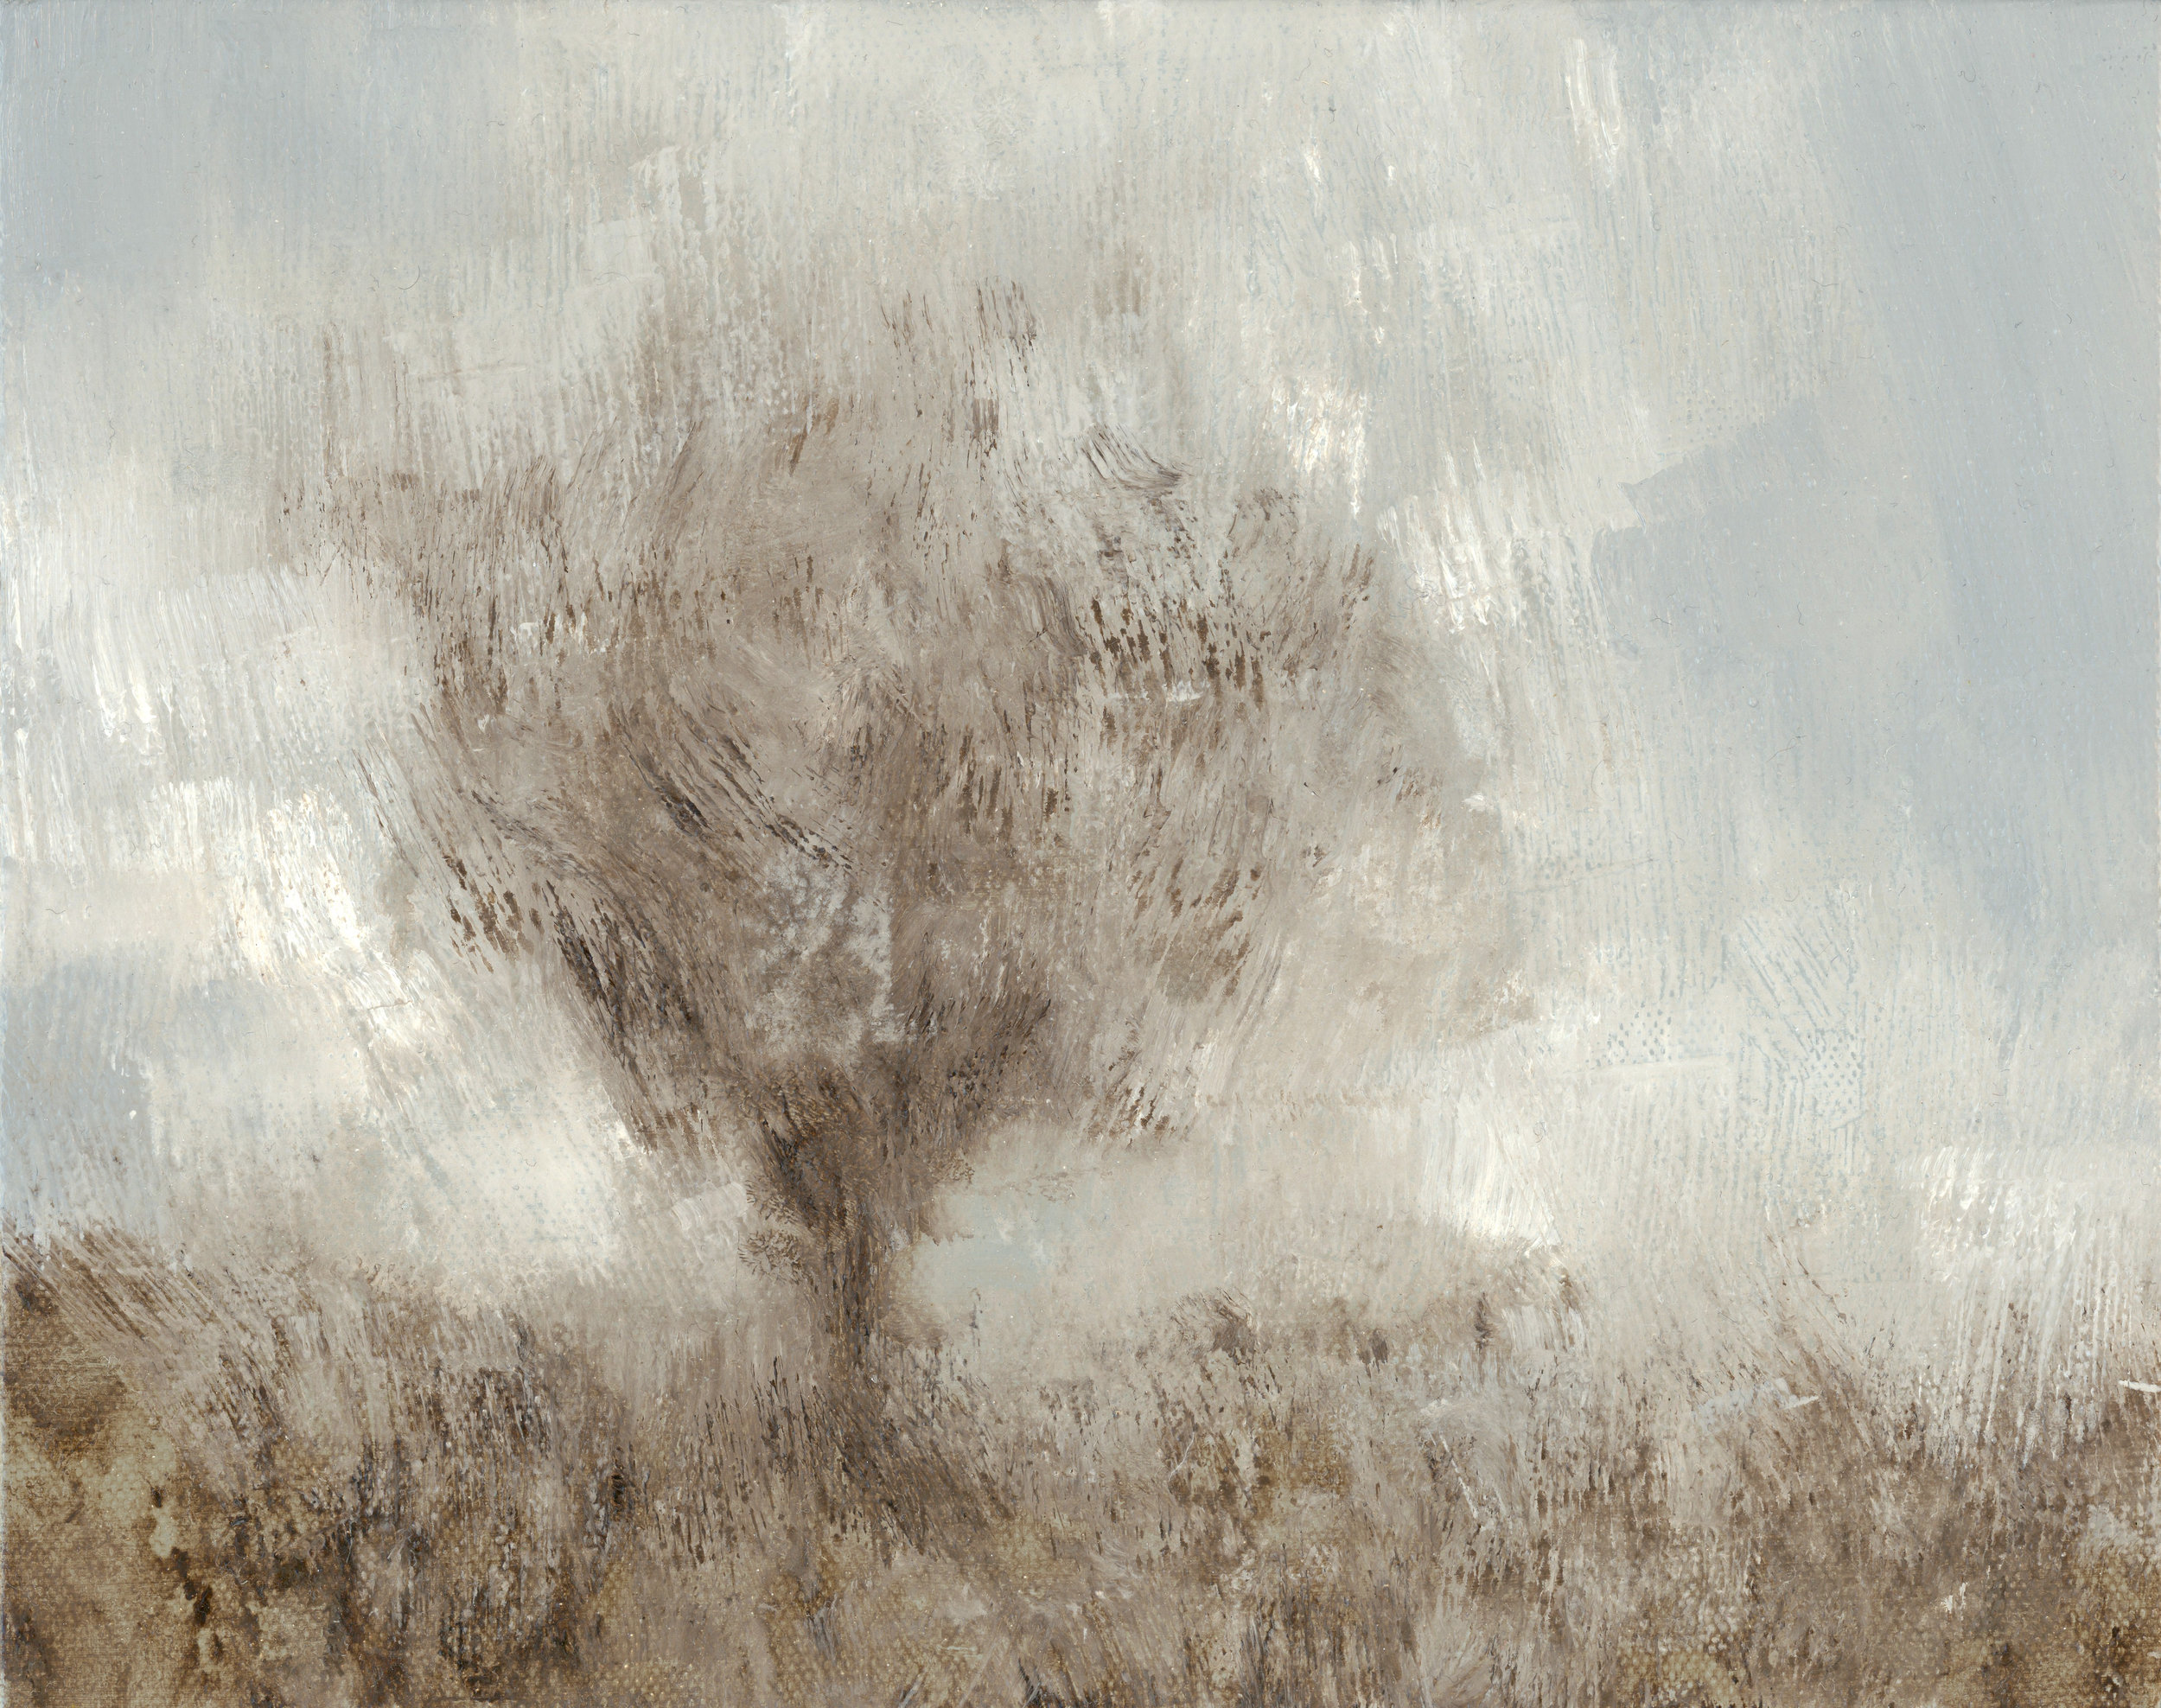 Glenn-Suokko-Landscape-902.jpg